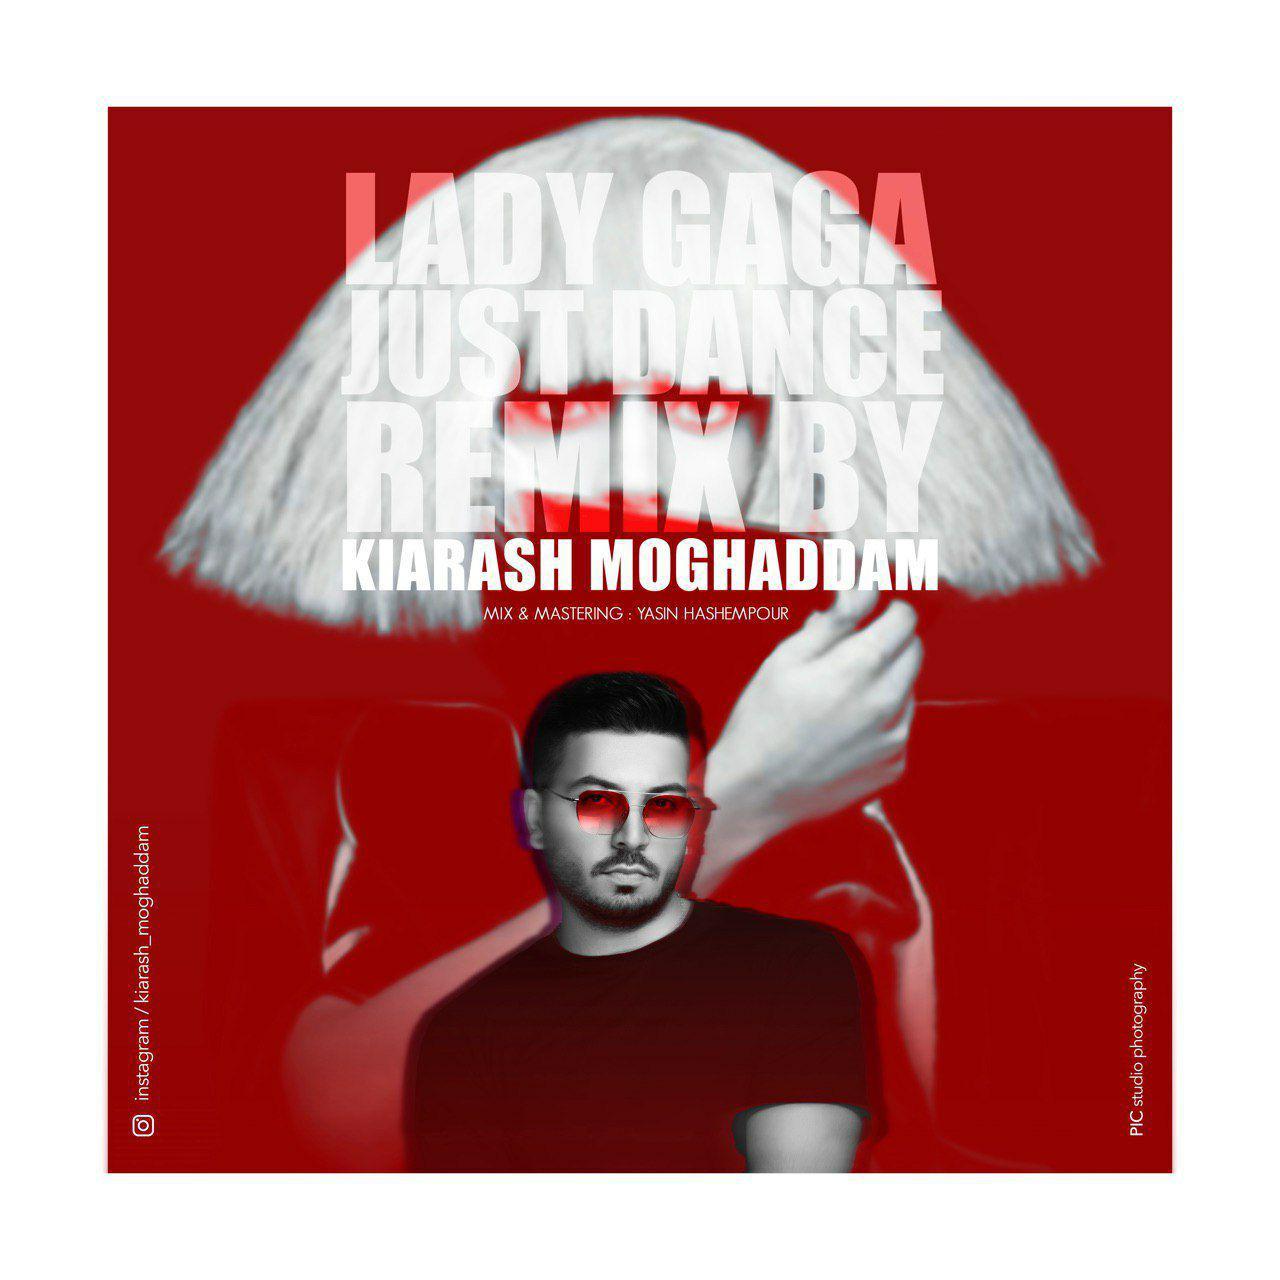 Kiarash Moghaddam – Just Dance (Remix)